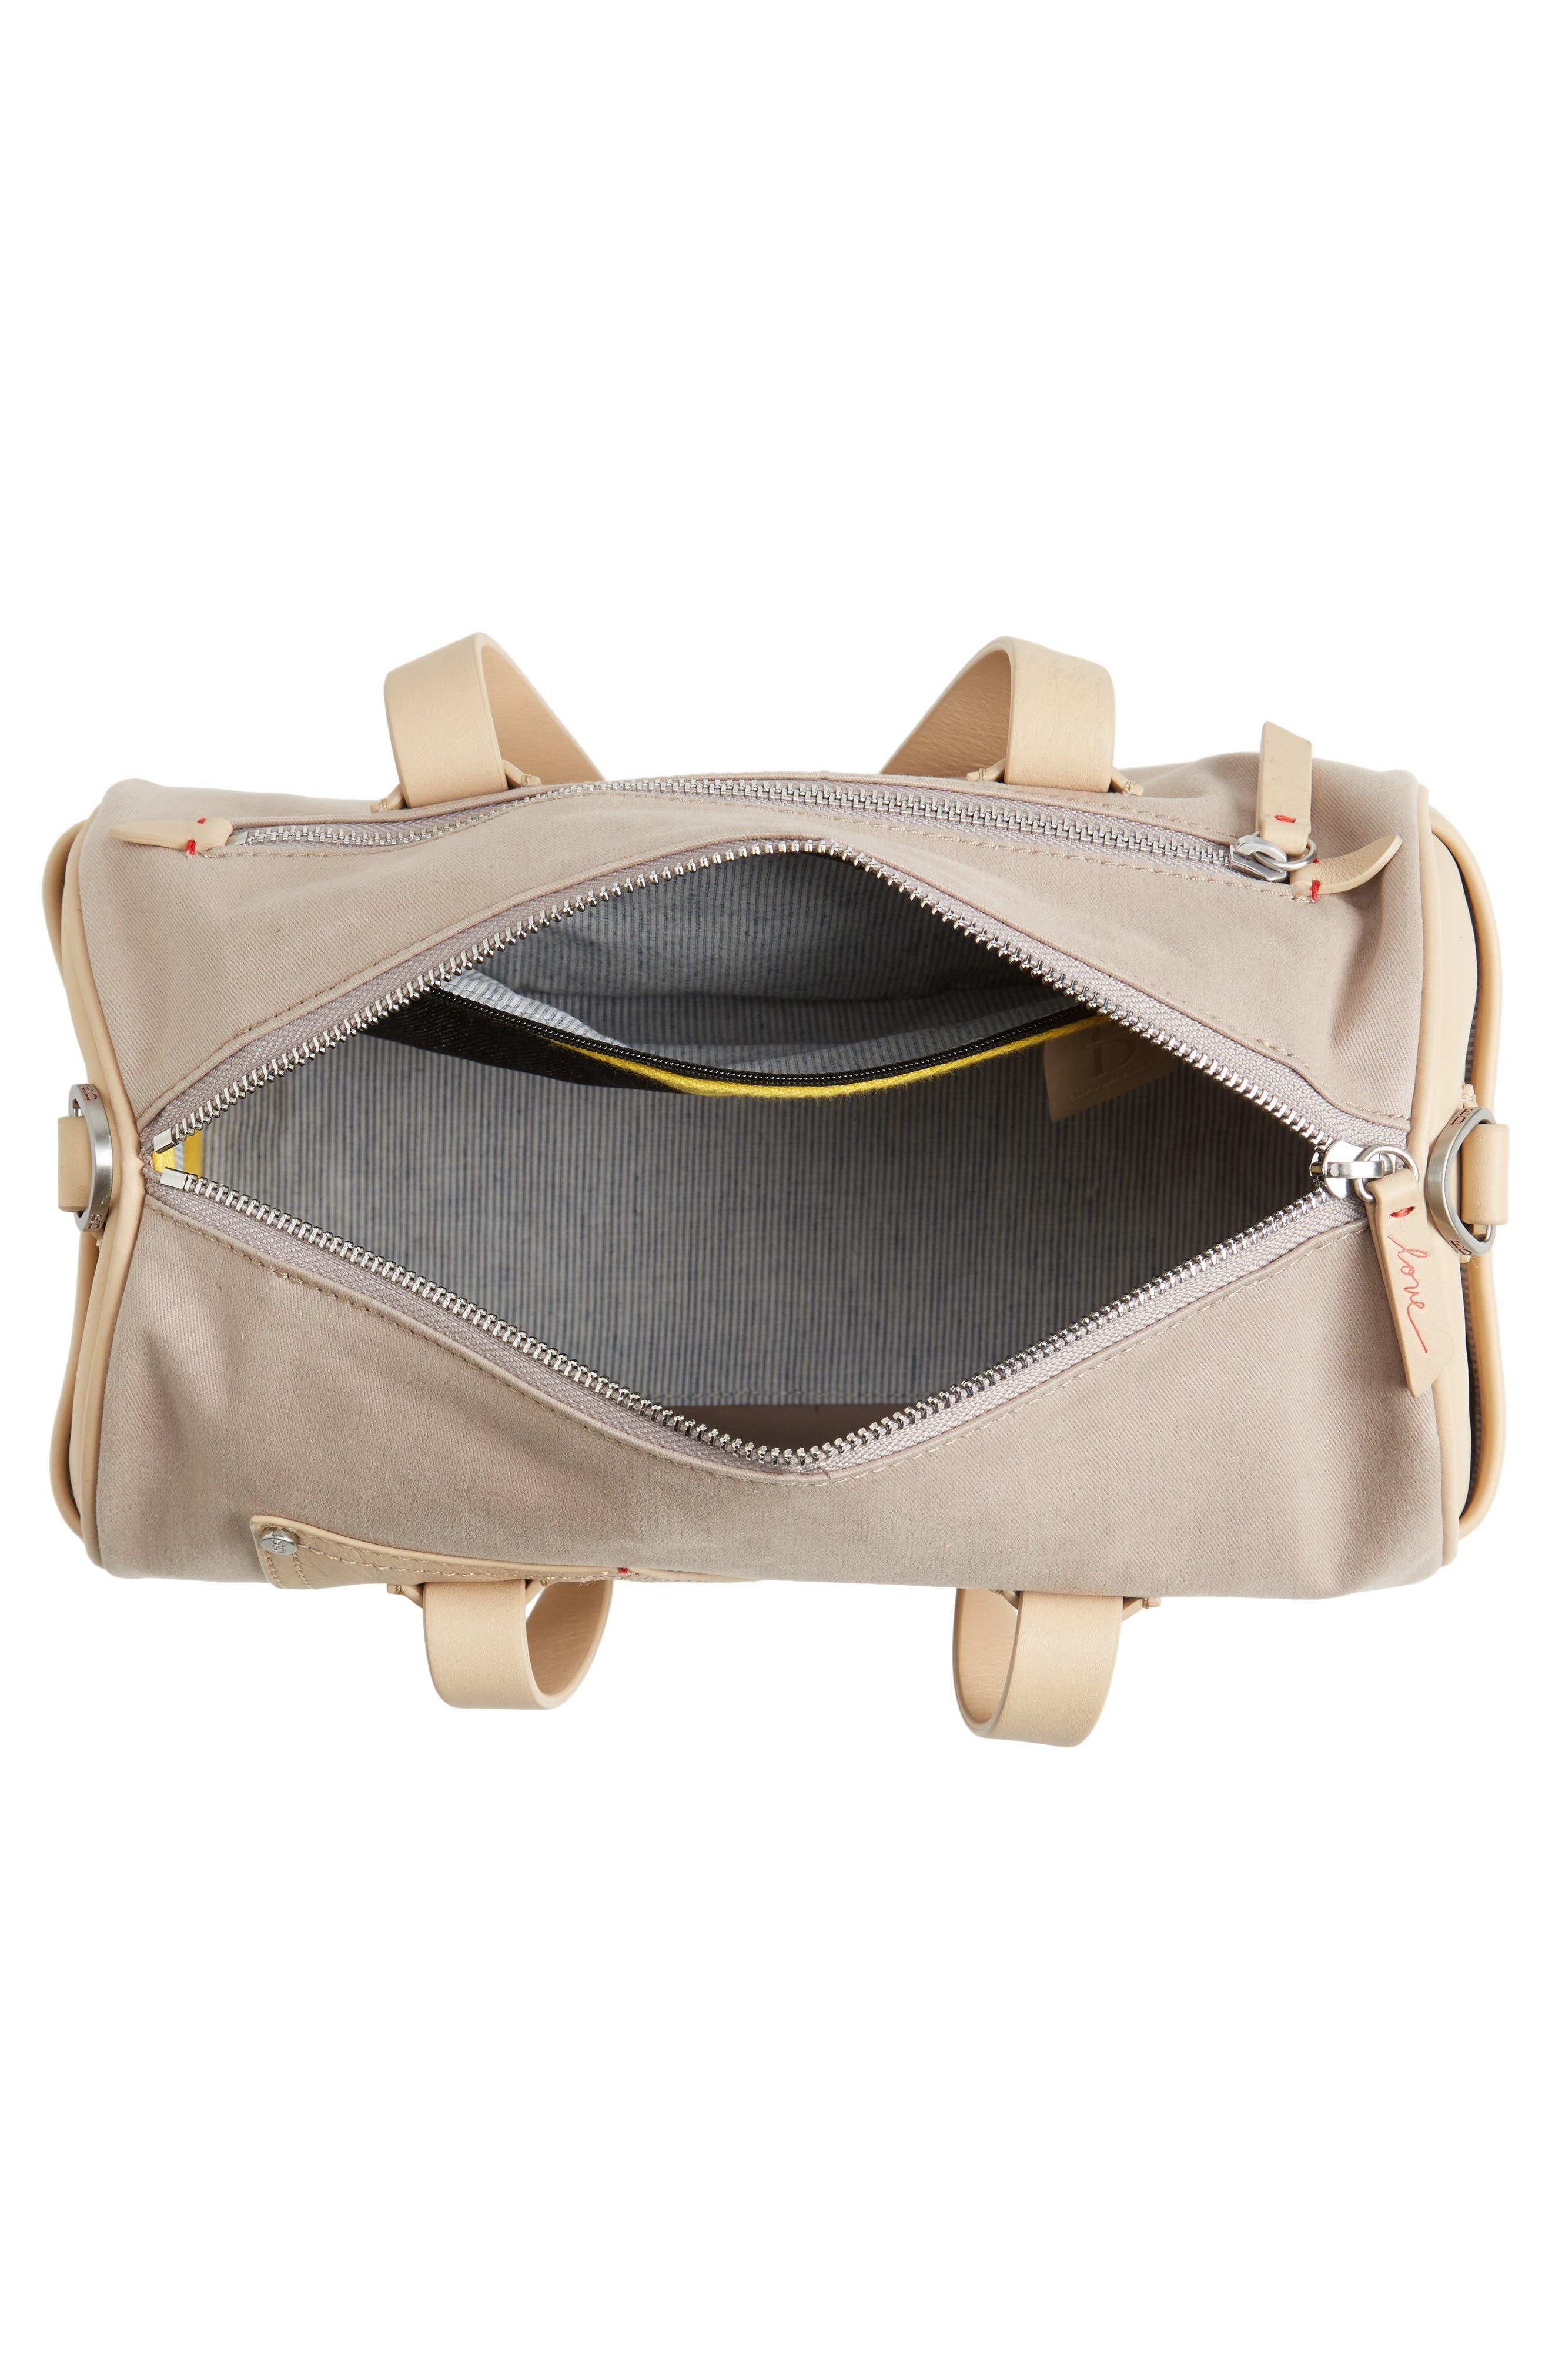 Alternate Image 3  - ED Ellen DeGeneres Mini Carml Leather & Canvas Barrel Bag